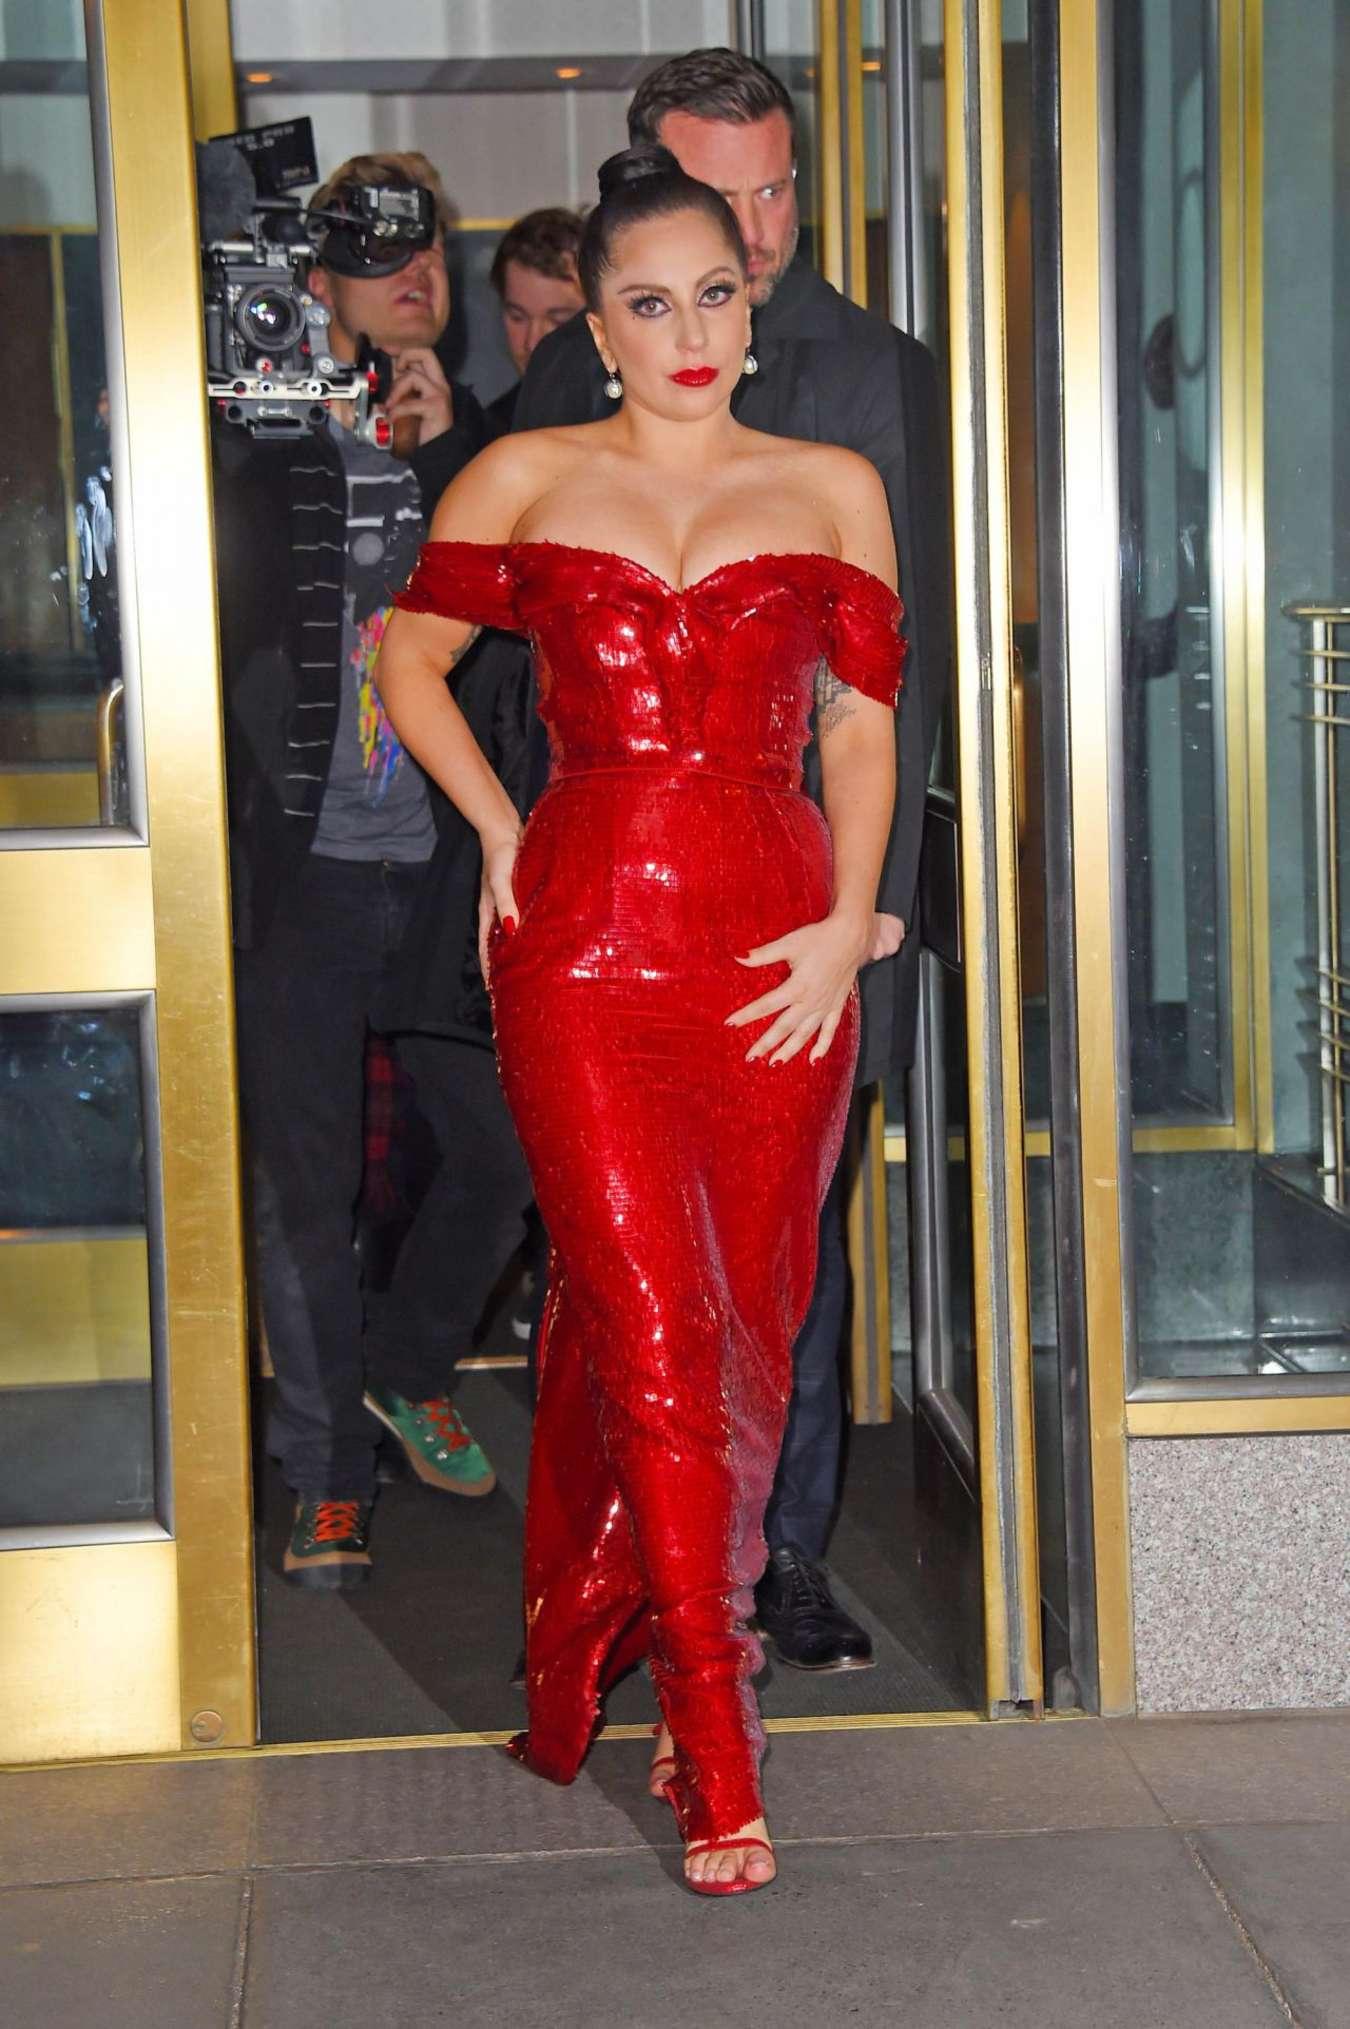 Lady Gaga Red Dress - RP Dress